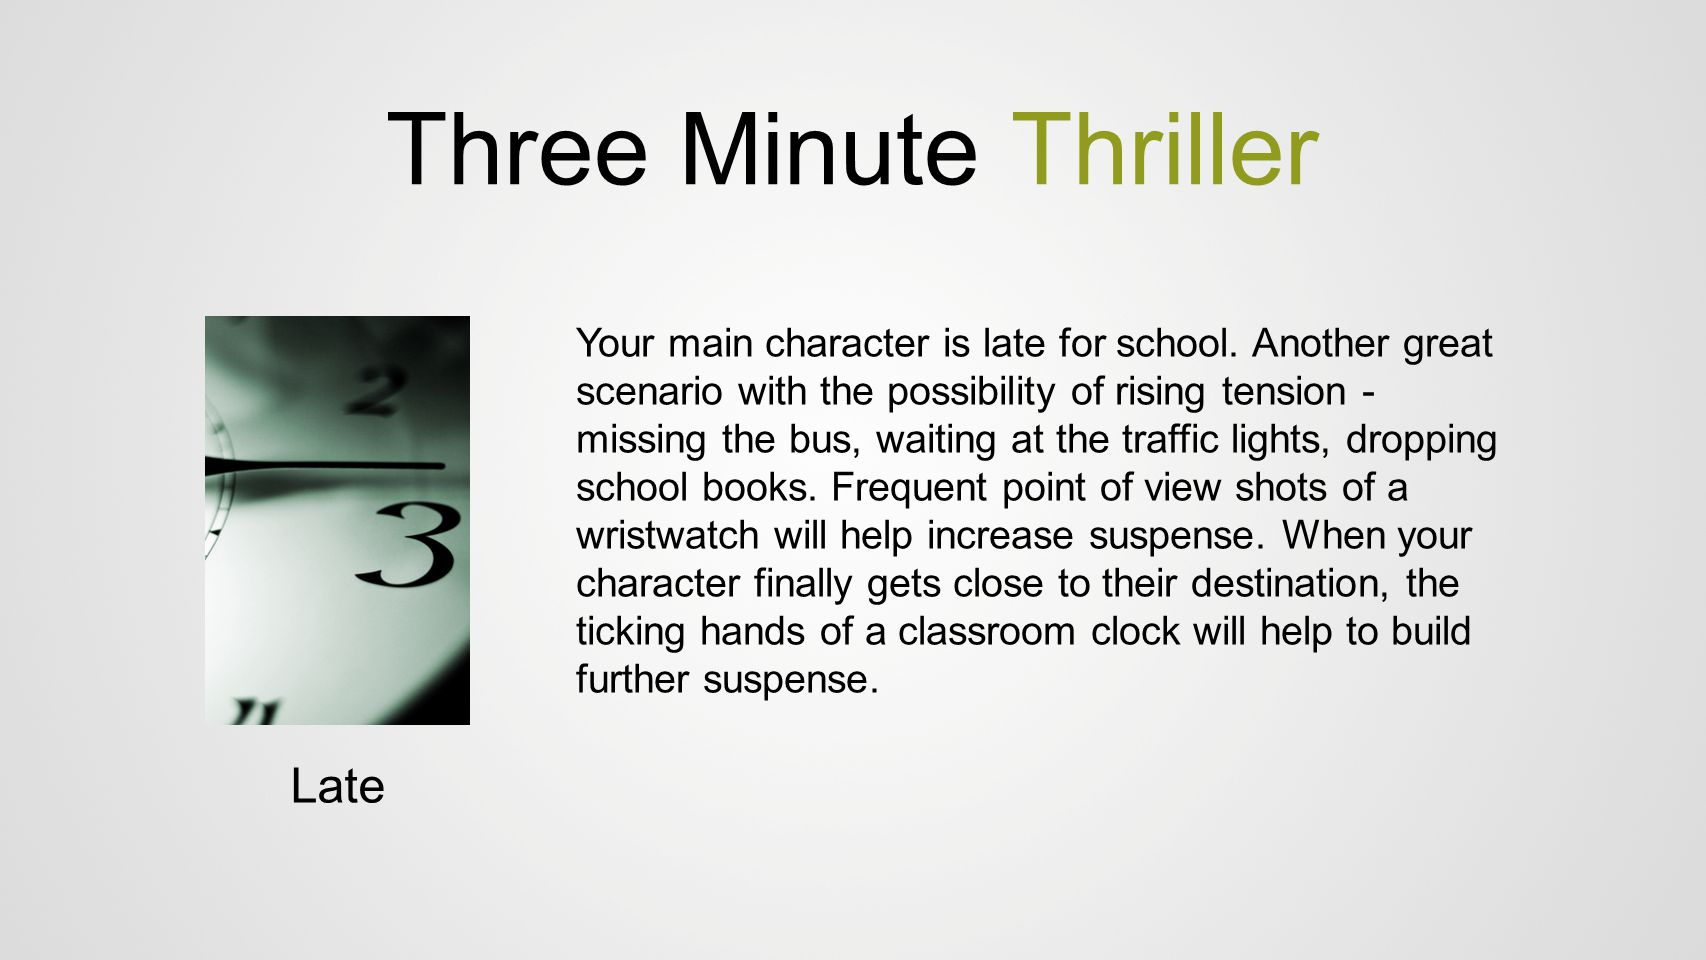 Three Minute Thriller Late